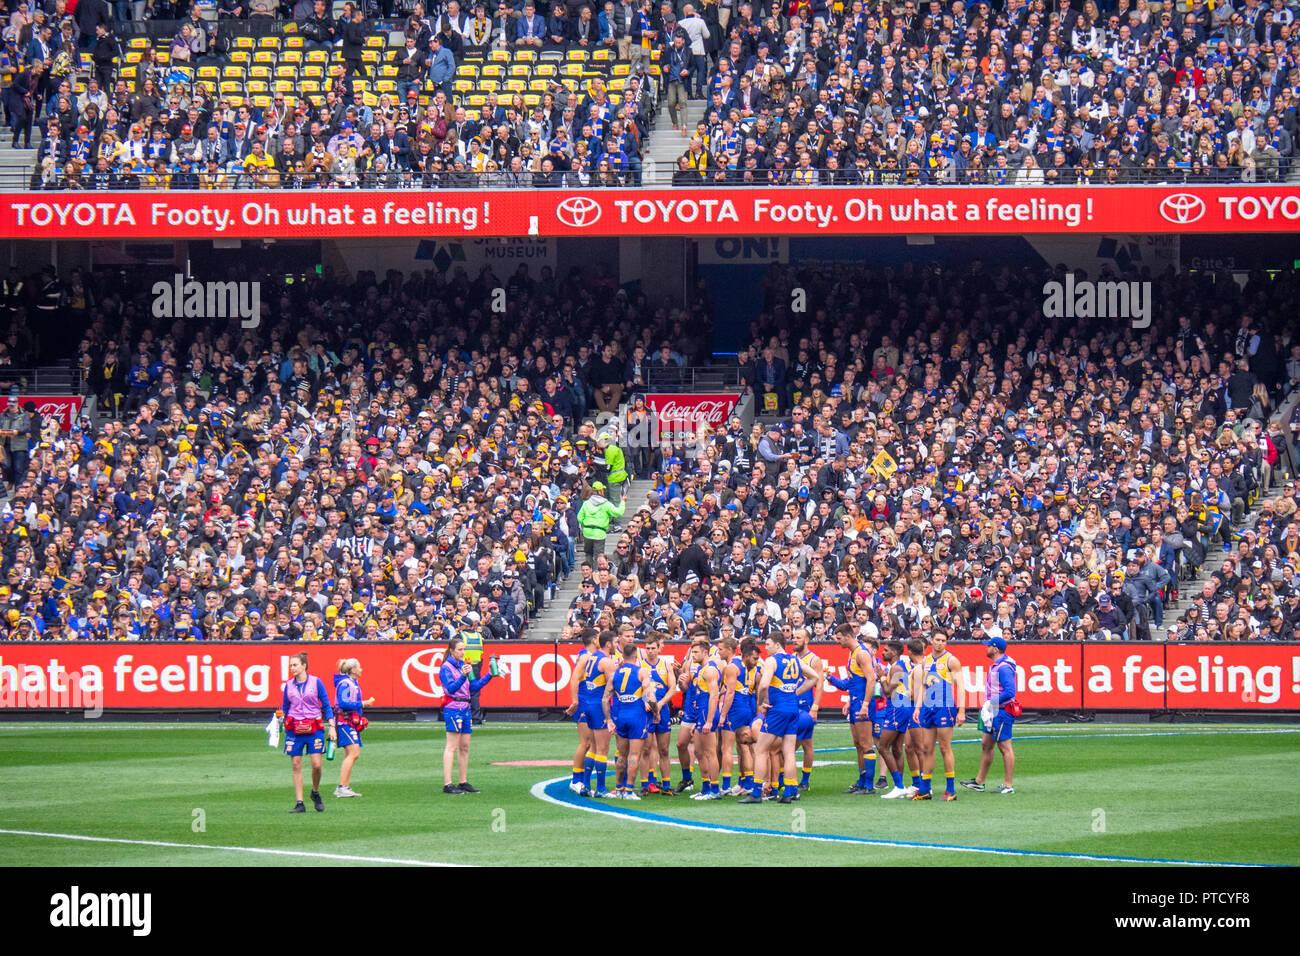 2018 AFL Grand Final at MCG Melbourne Victoria Australia. - Stock Image